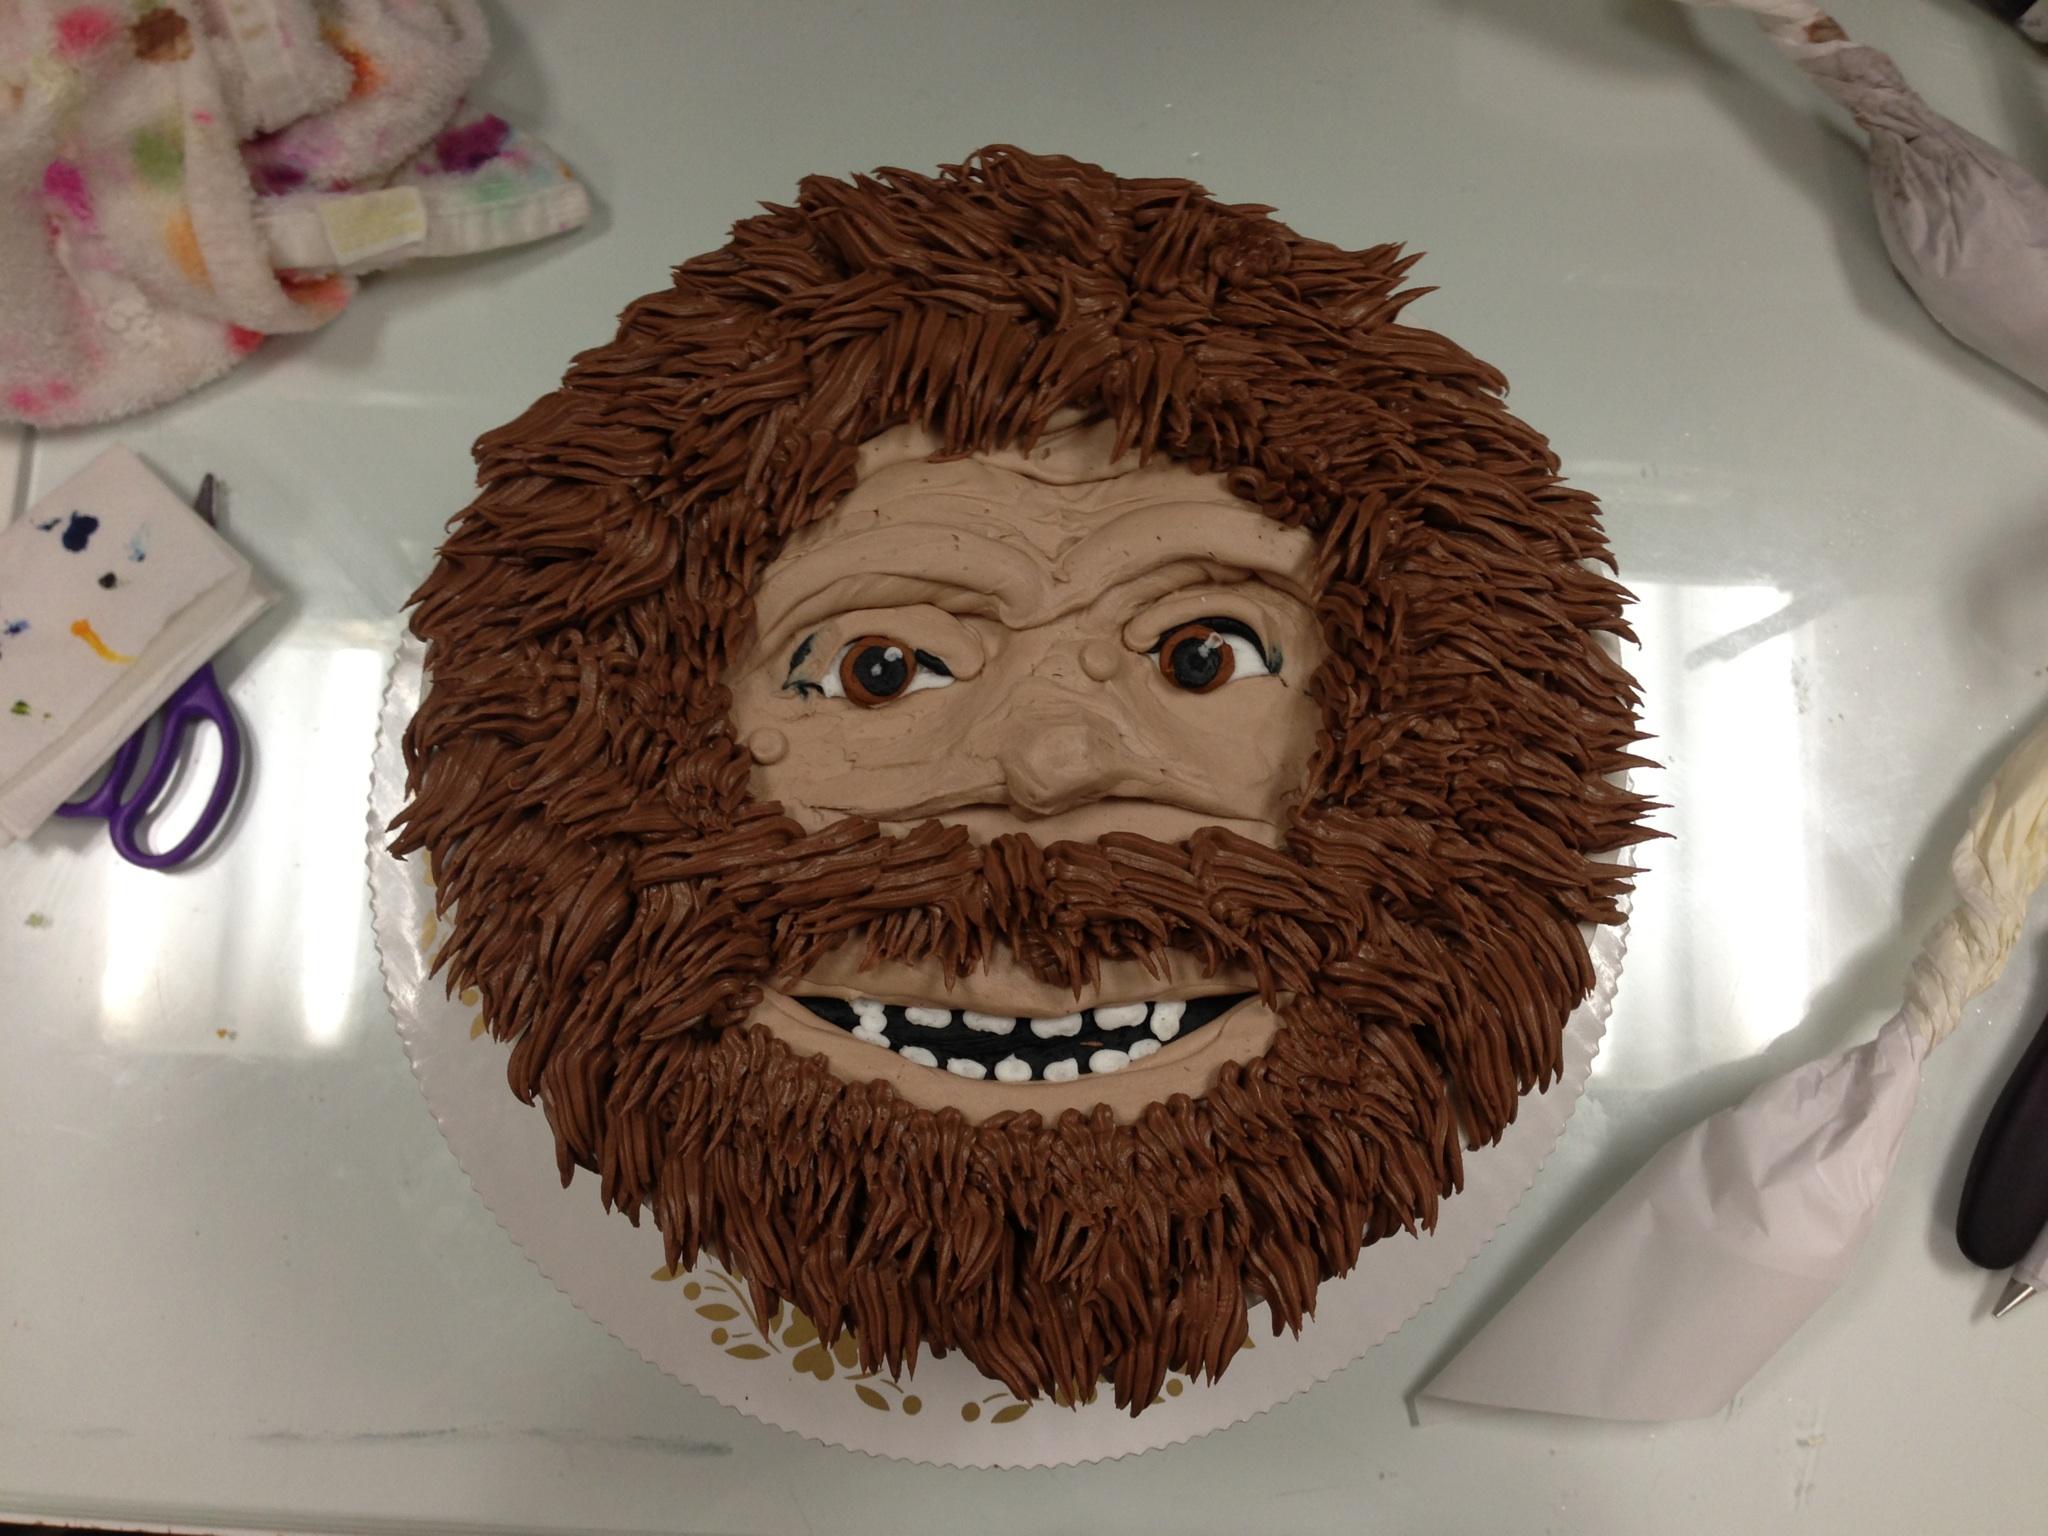 Caveman/Bigfoot Face